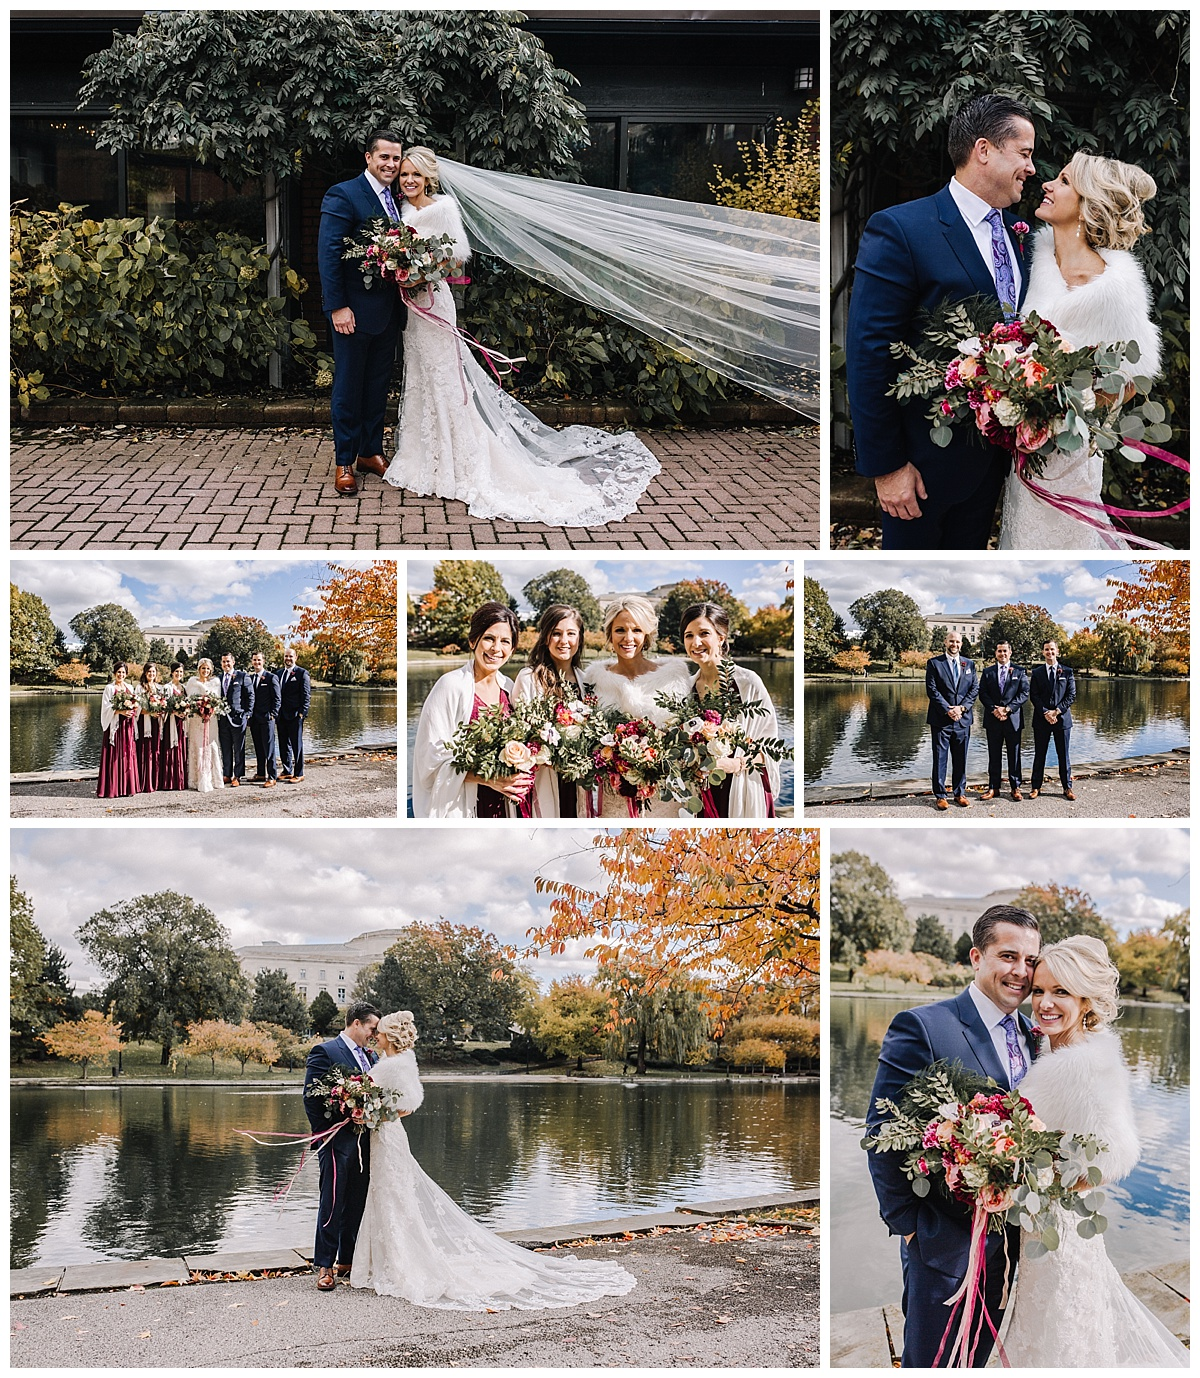 Wade Oval - Cleveland - Northeast Ohio Wedding Photographer